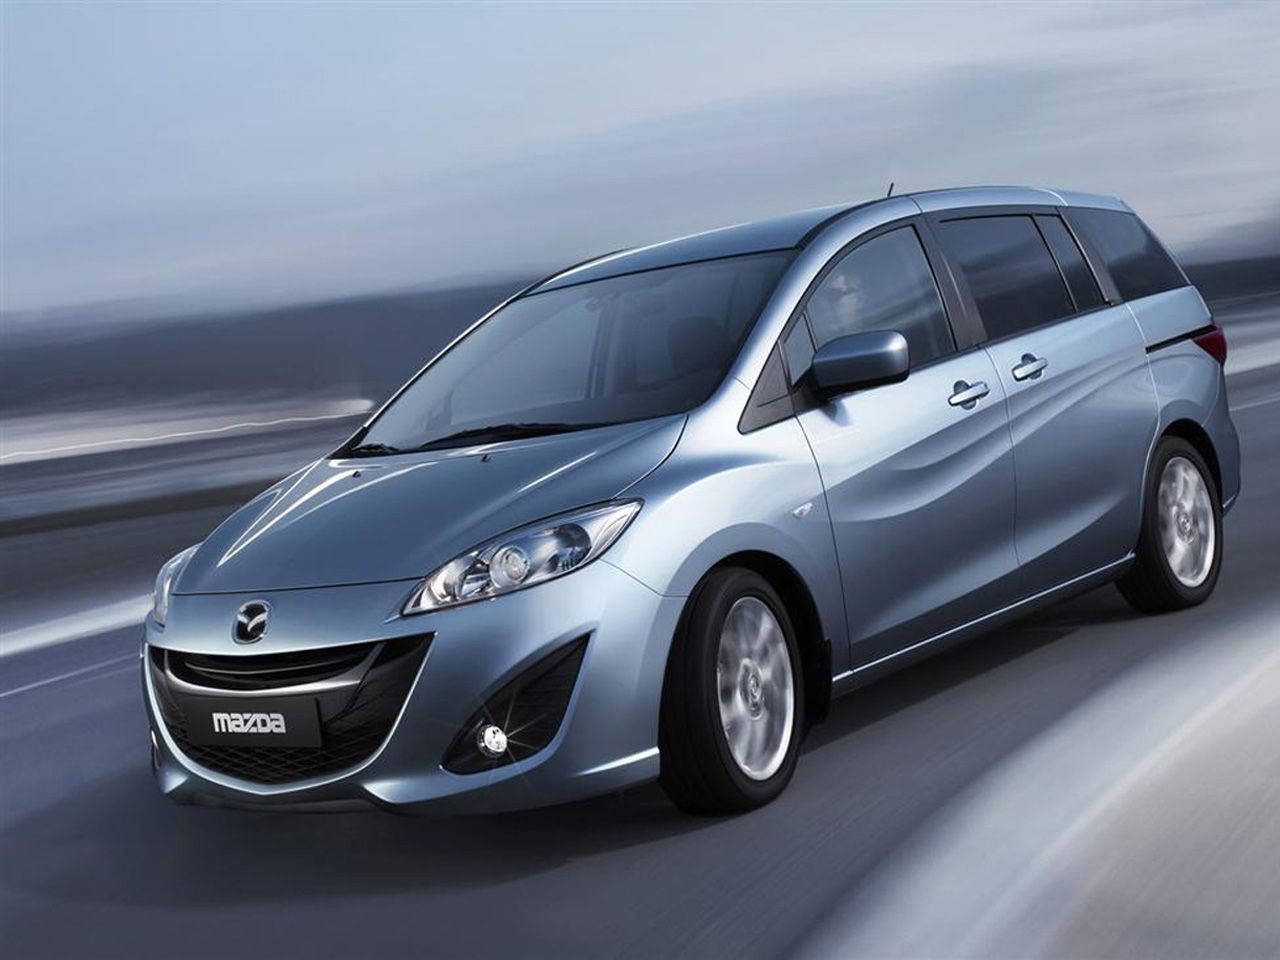 Mazda Premacy 2010 Front Side Angle Wallpaper 1280x960